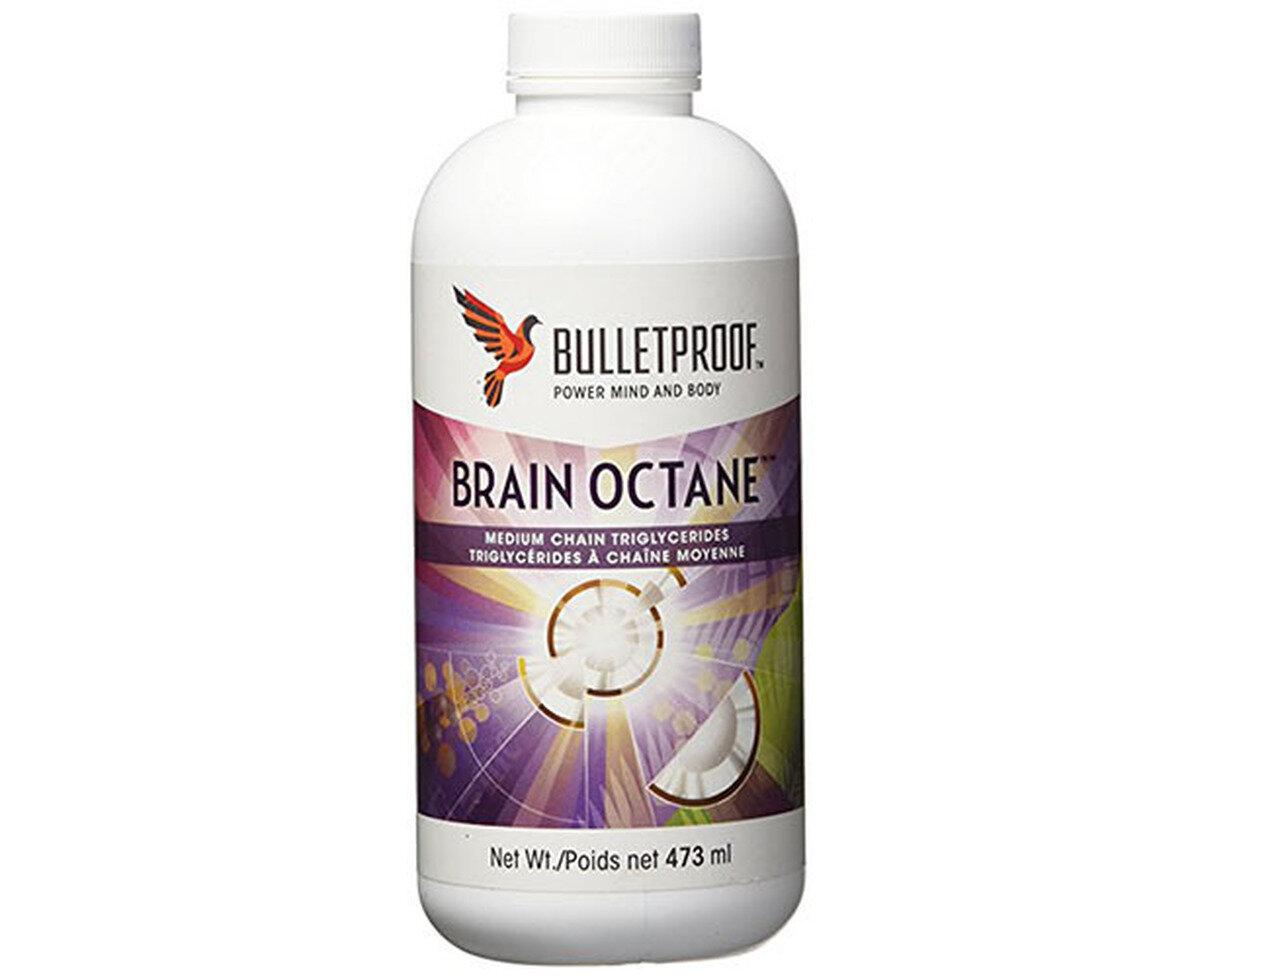 Bulletproof - Brain Octane 946 ml